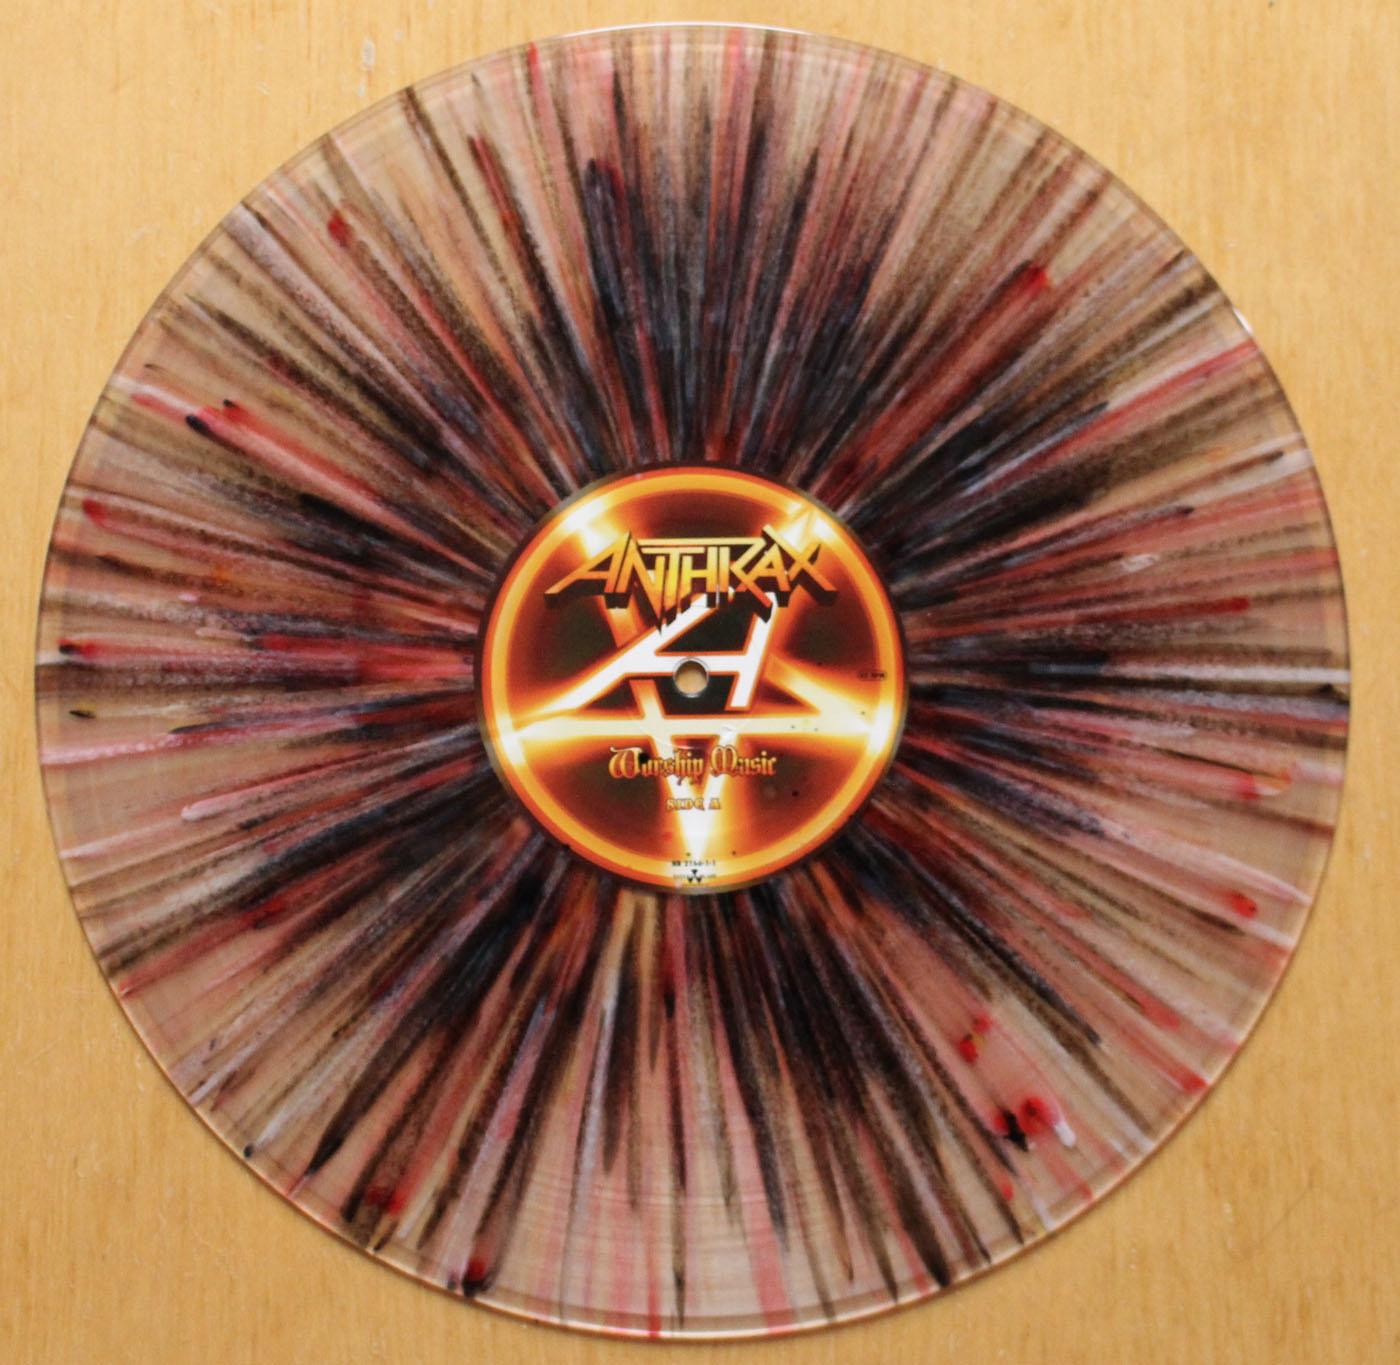 Anthrax Worship Music Splatter Vinyl Lp 12 Inch